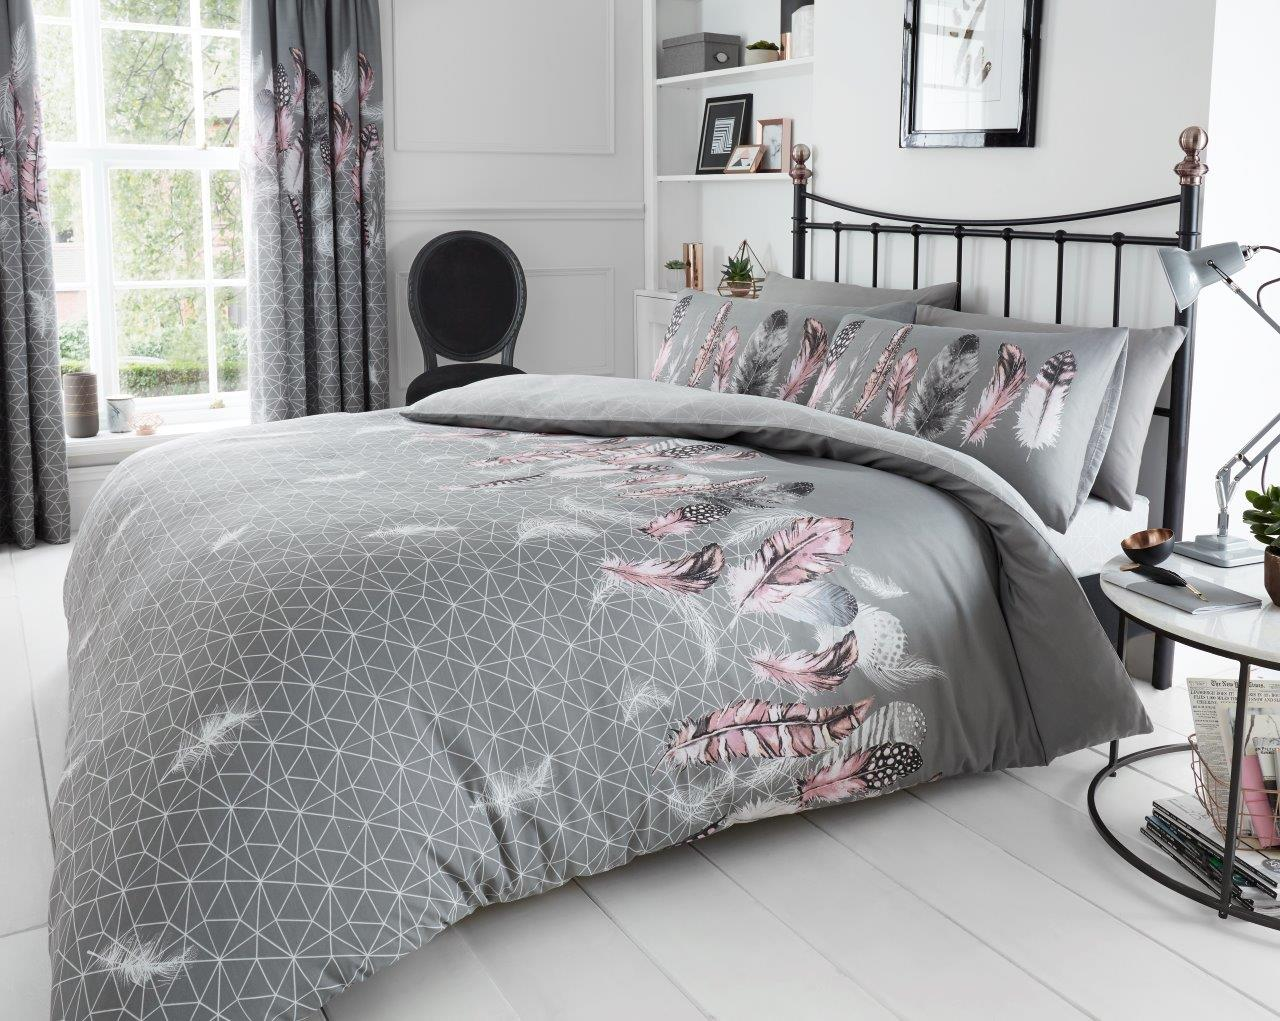 Feathers Print Duvet Cover Set Designer Bed With Pillowcases De